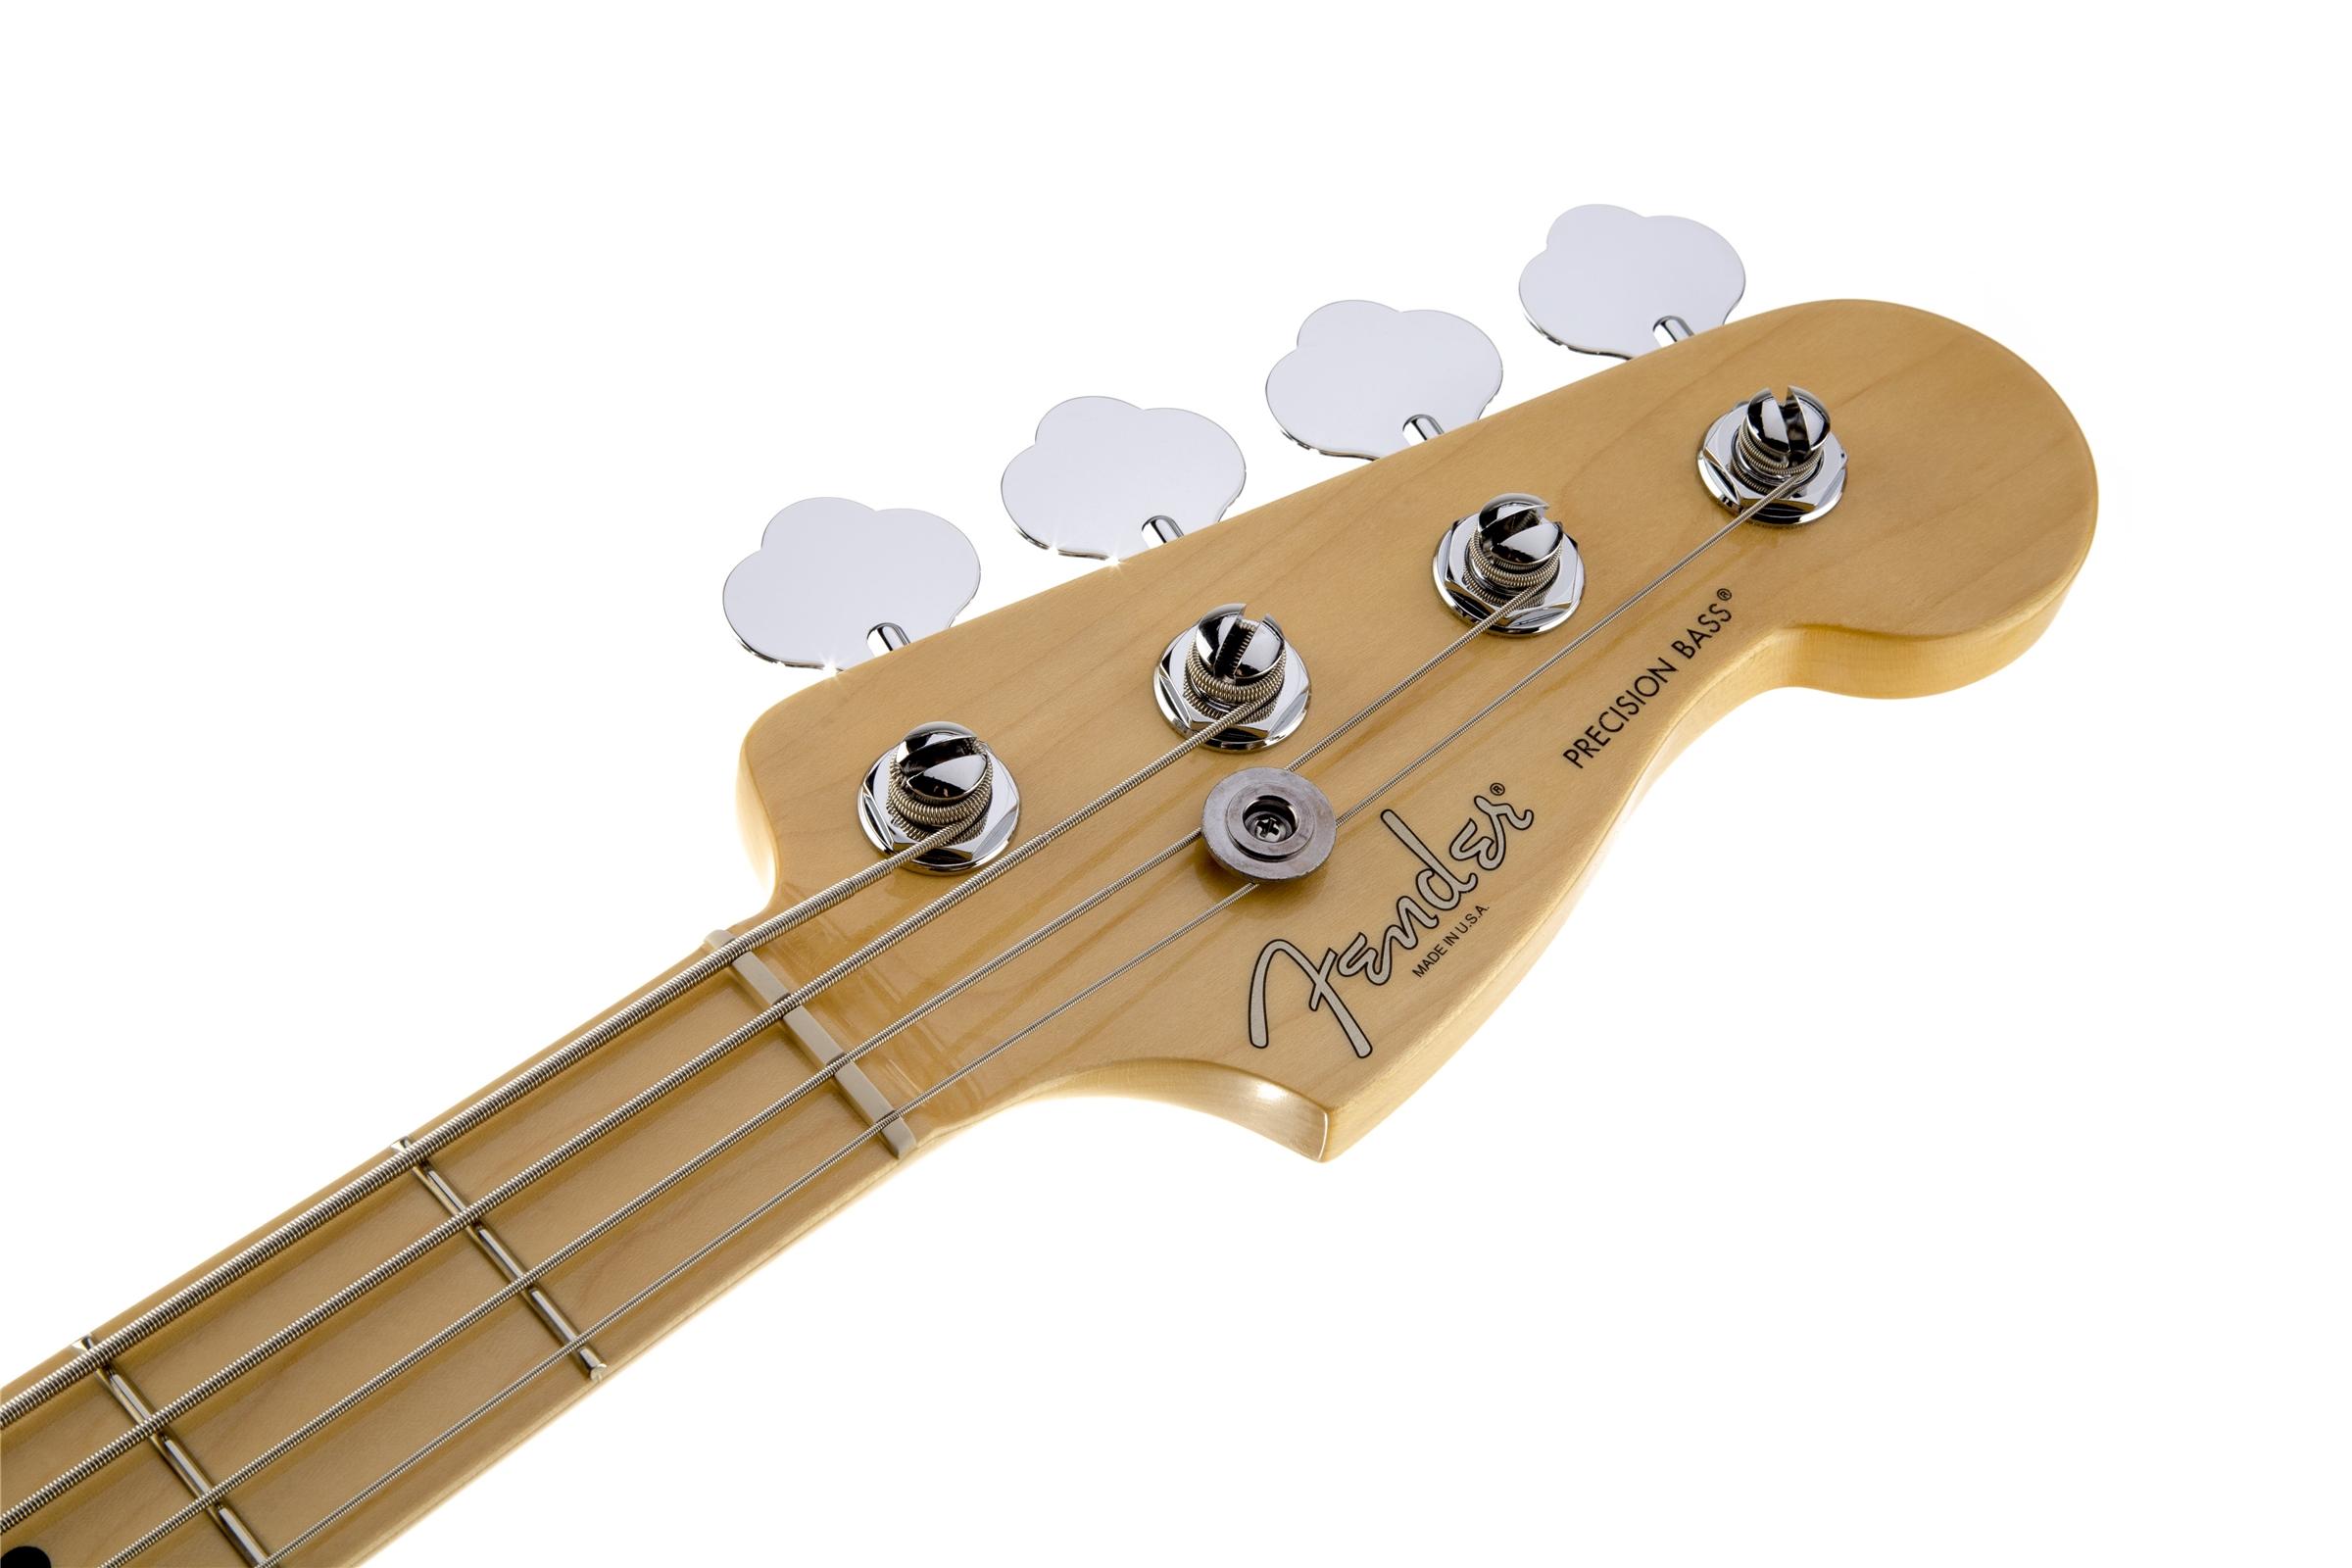 Fender American Standard Precision Bass® Black Maple Fingerboard Electric Bass Guitar